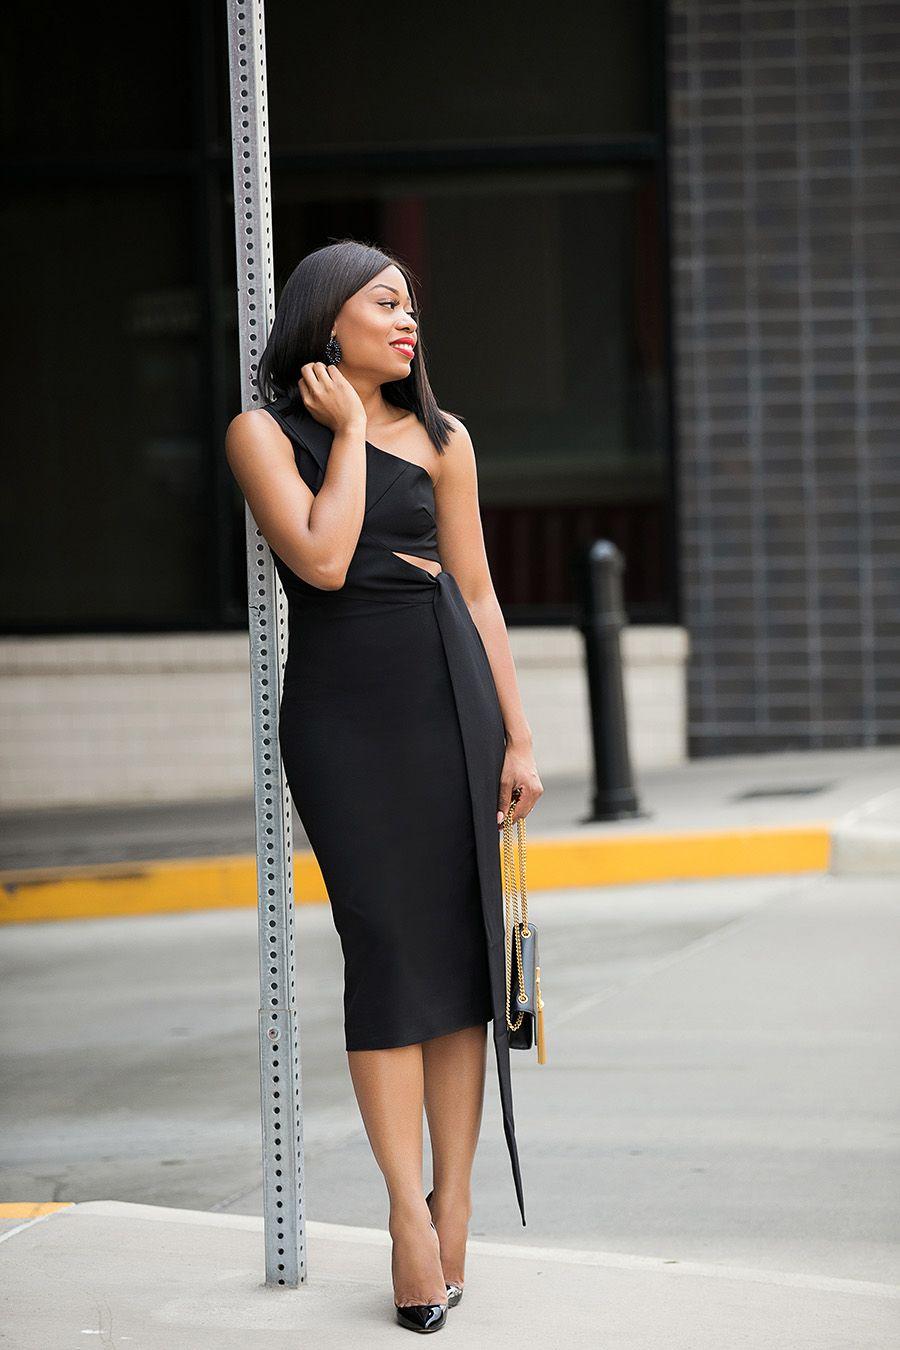 Summer Wedding Black Dress Www Jadore Fashion Com Fashion Black Wedding Dresses Curvy Girl Fashion [ 1350 x 900 Pixel ]